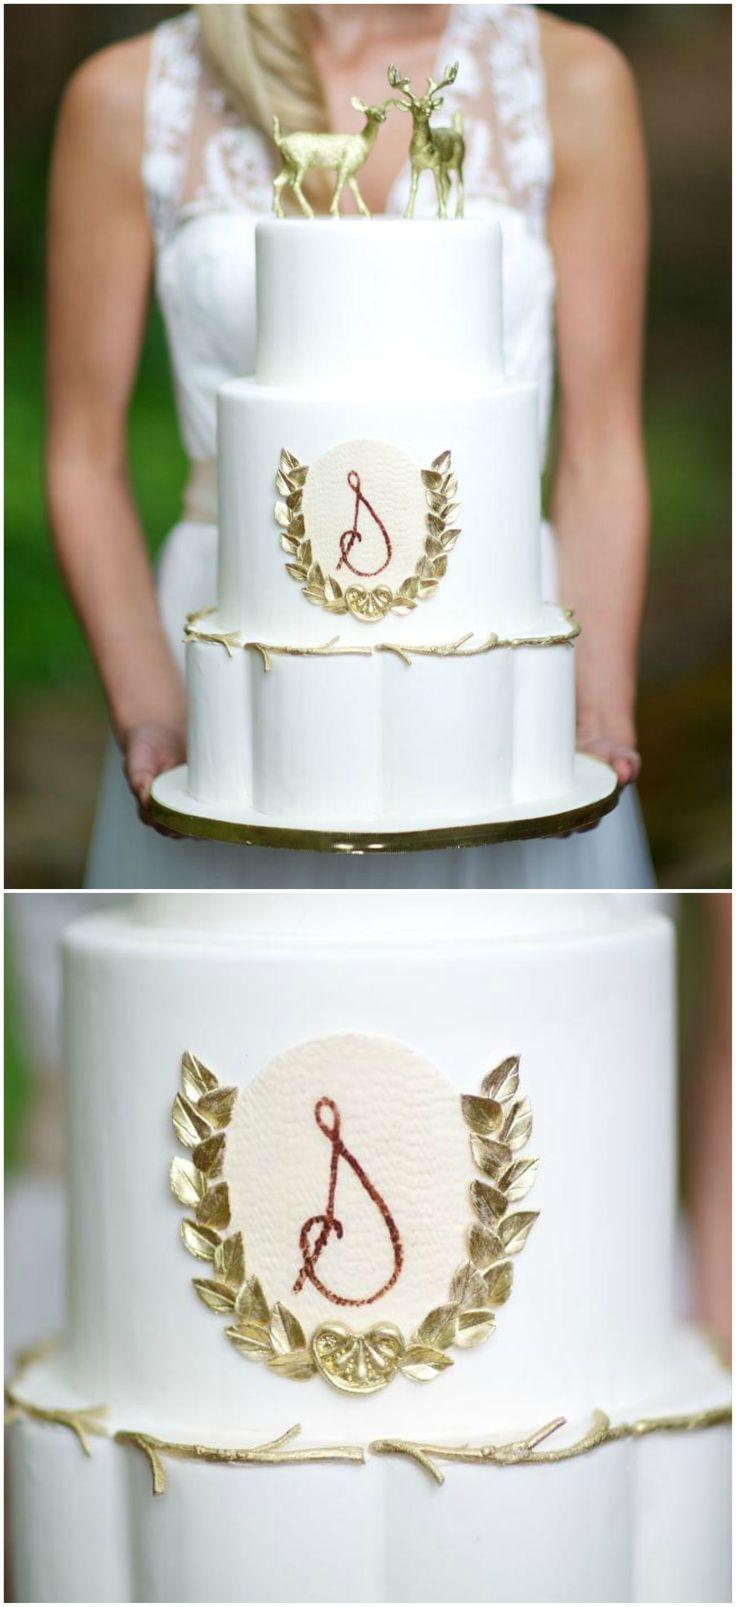 Wedding cake, gold deer cake topper, cursive S, gold leaves, white fondant // Arden Photography